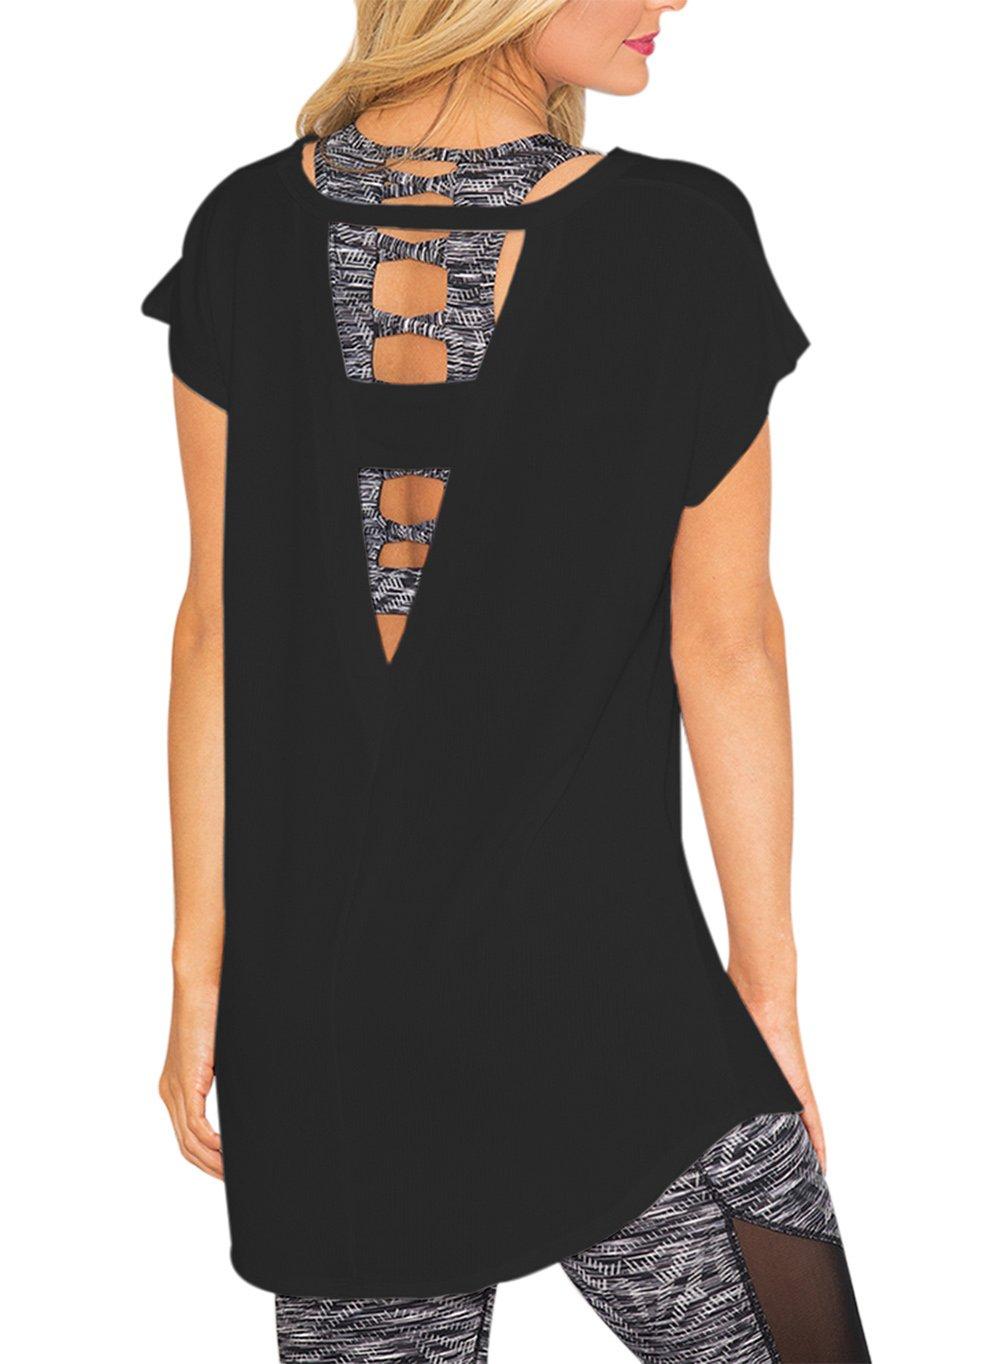 SOLO POP Women's Loose Tops Large V Back Cut Out Blouses Open Strap Workout Casual Shirt(Black,L)